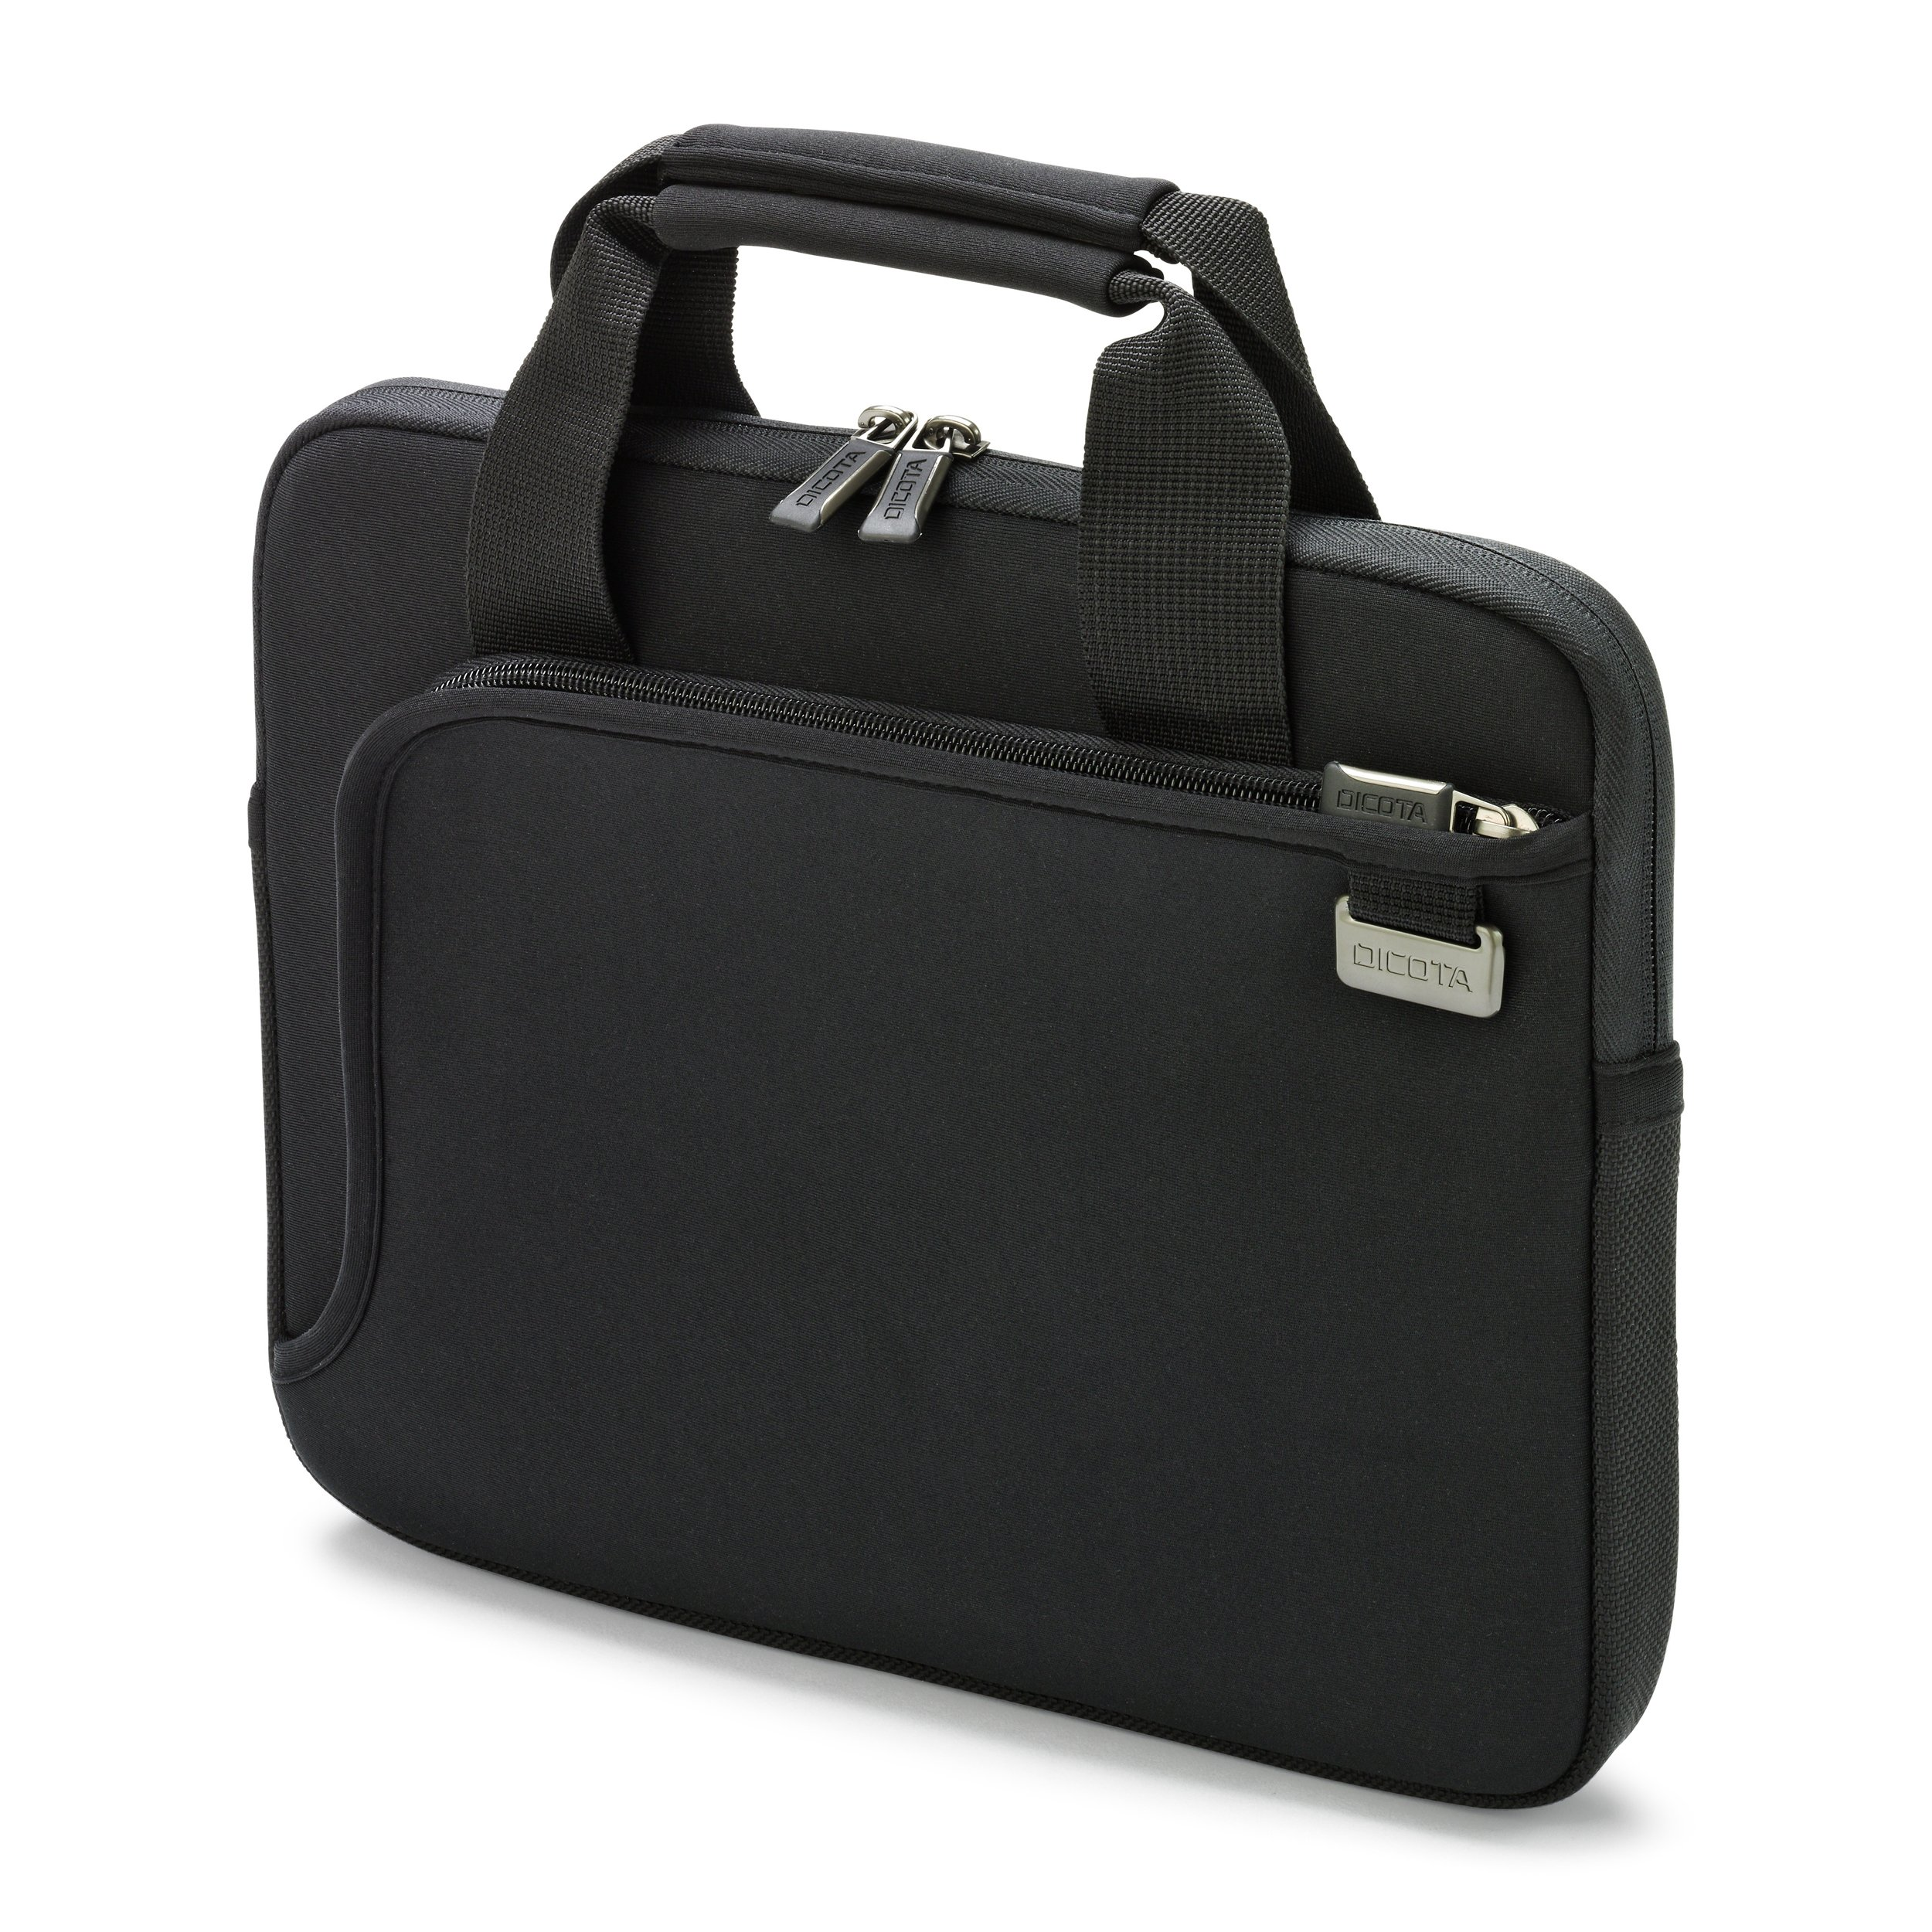 Dicota D31181 14.1 Sleeve case Black notebook case - notebook cases (35.8 cm (14.1), Sleeve cas